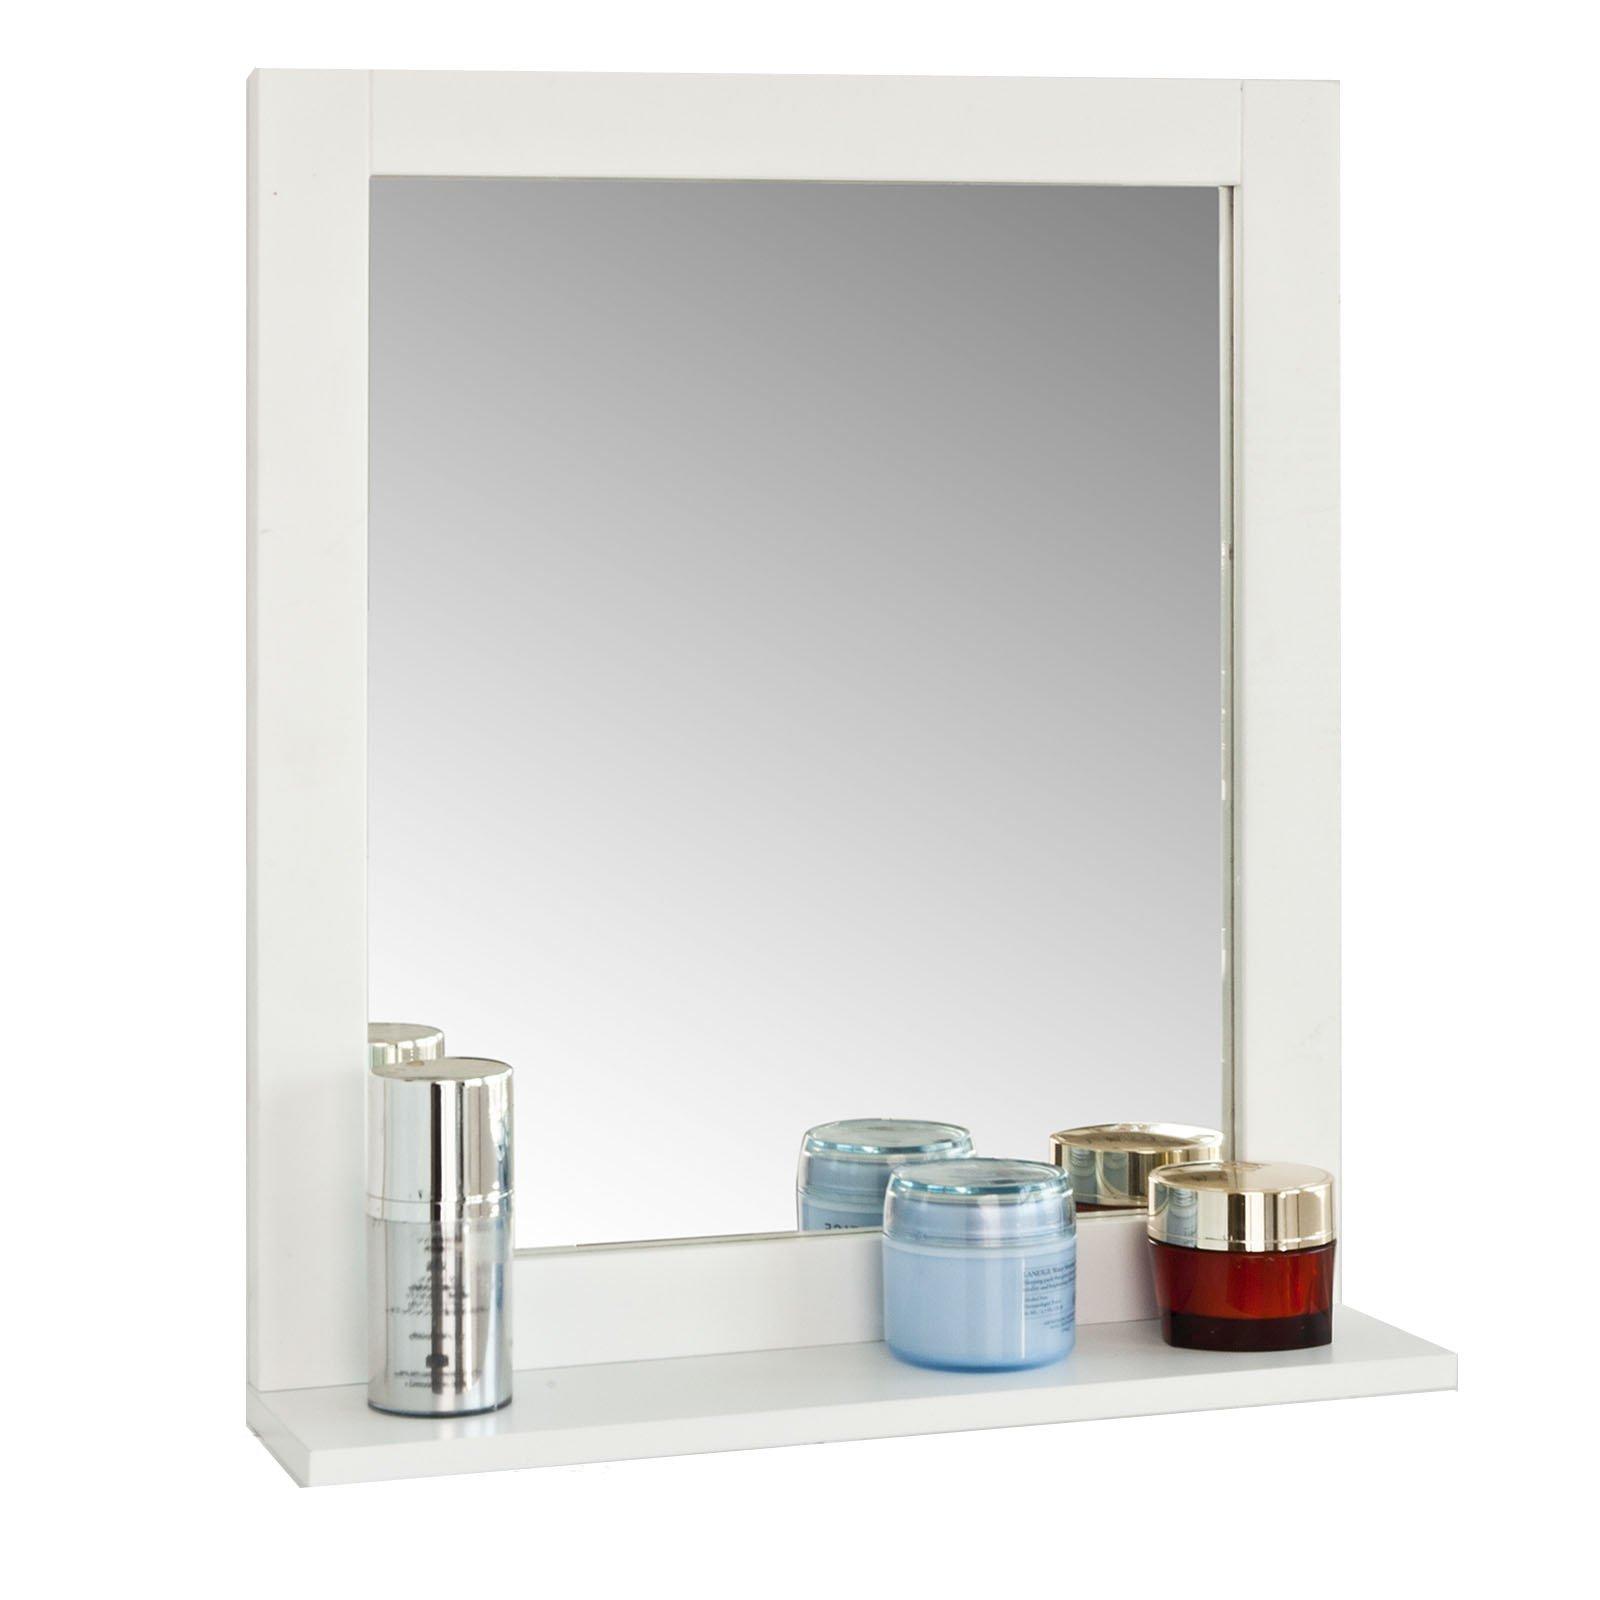 Haotian Wall Mounted Bathroom Mirror with Shelf, 40 x 49 x 10cm,FRG129-W,White